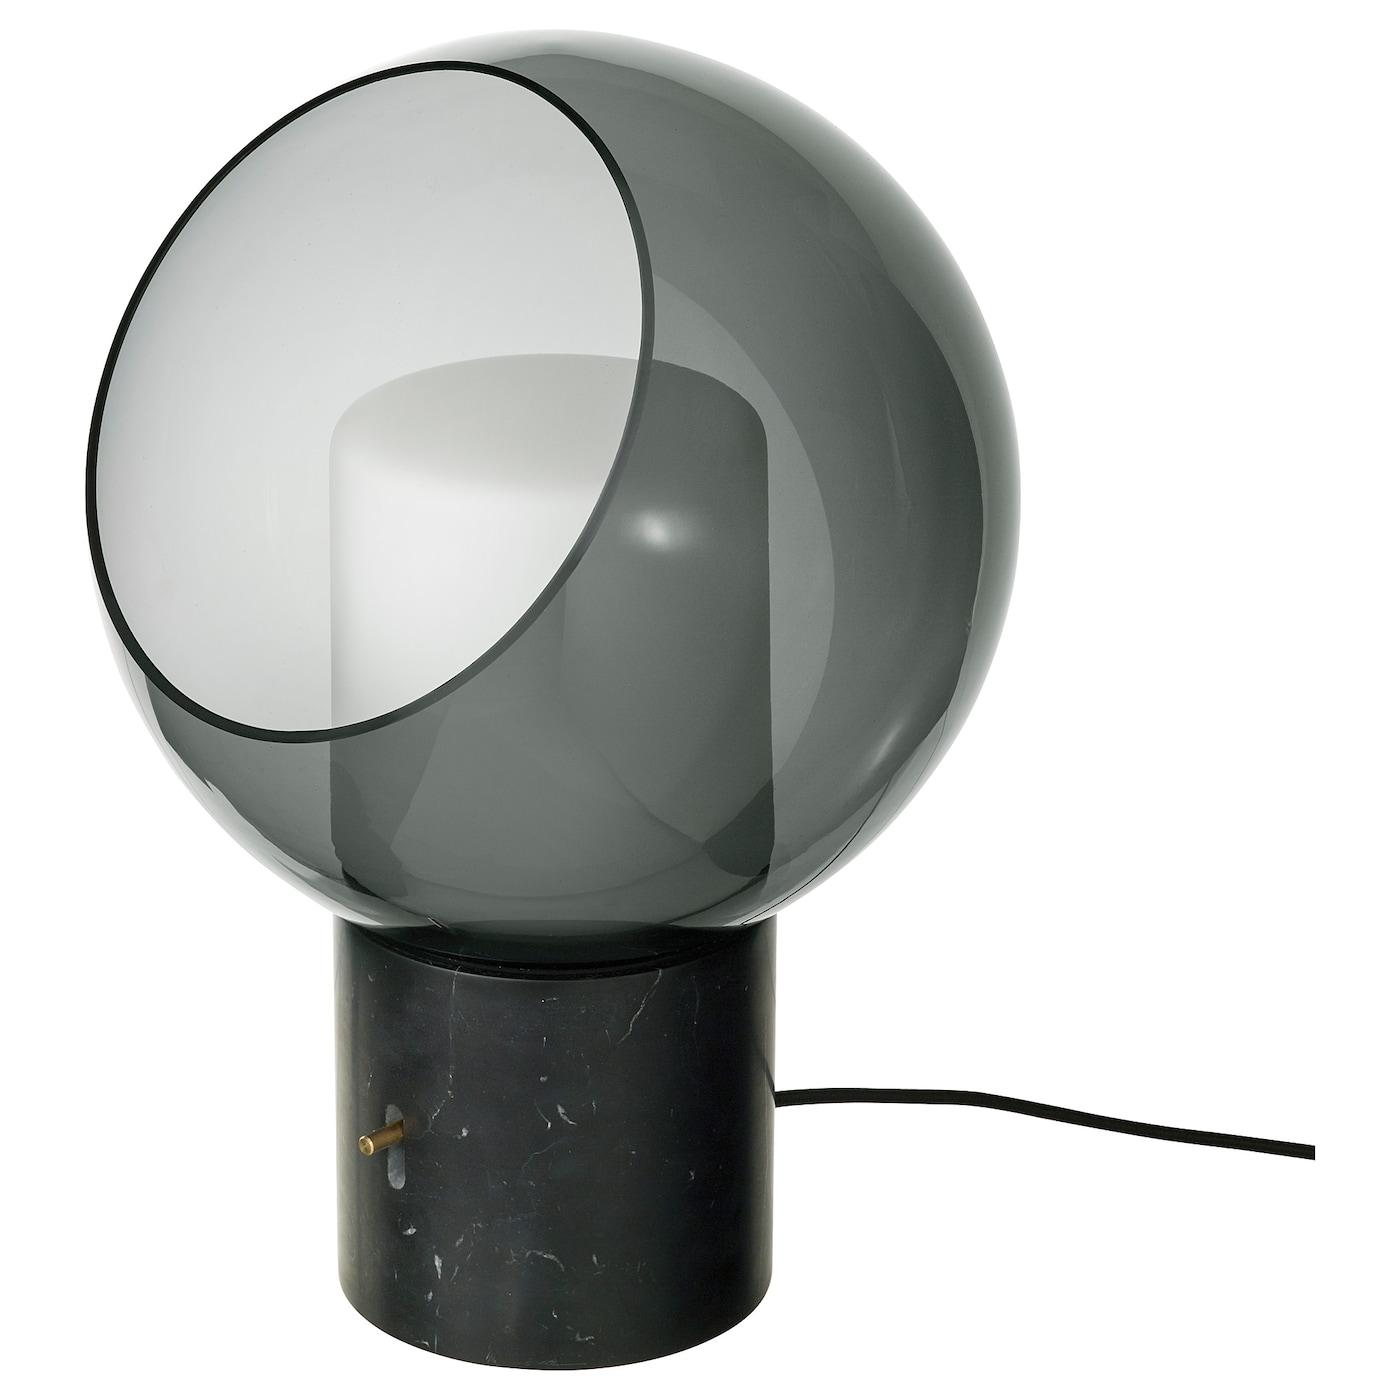 EVEDAL marble grey, globe grey globe